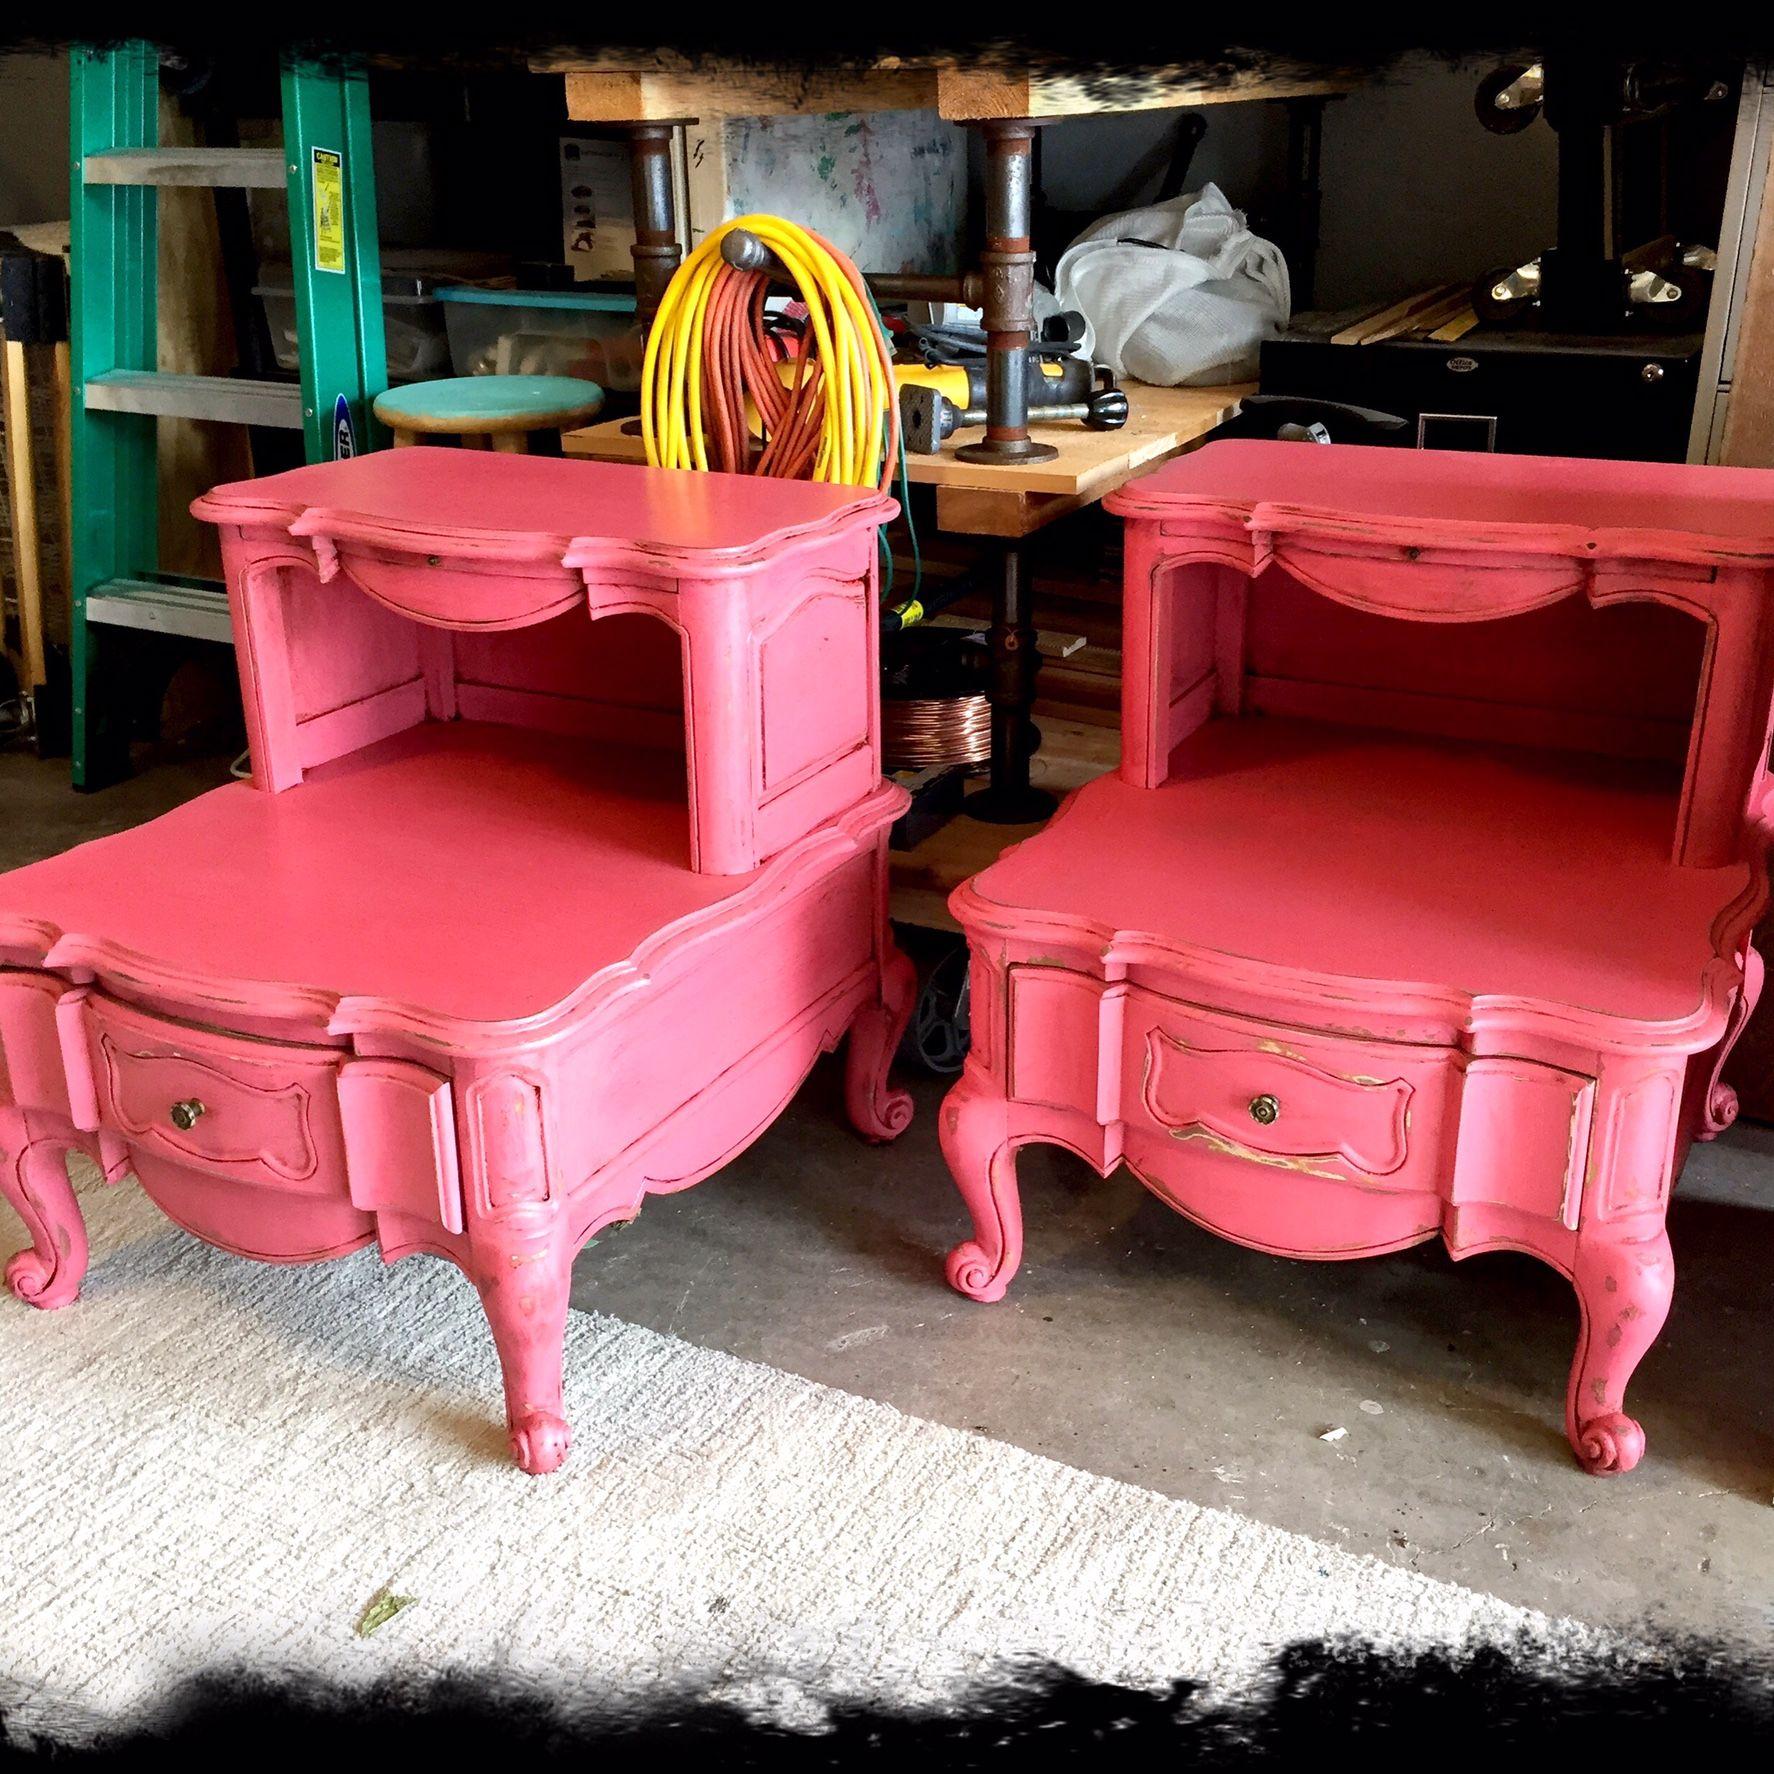 Pin de iliana noriega en ideas pinterest muebles for Sillas para viejitos